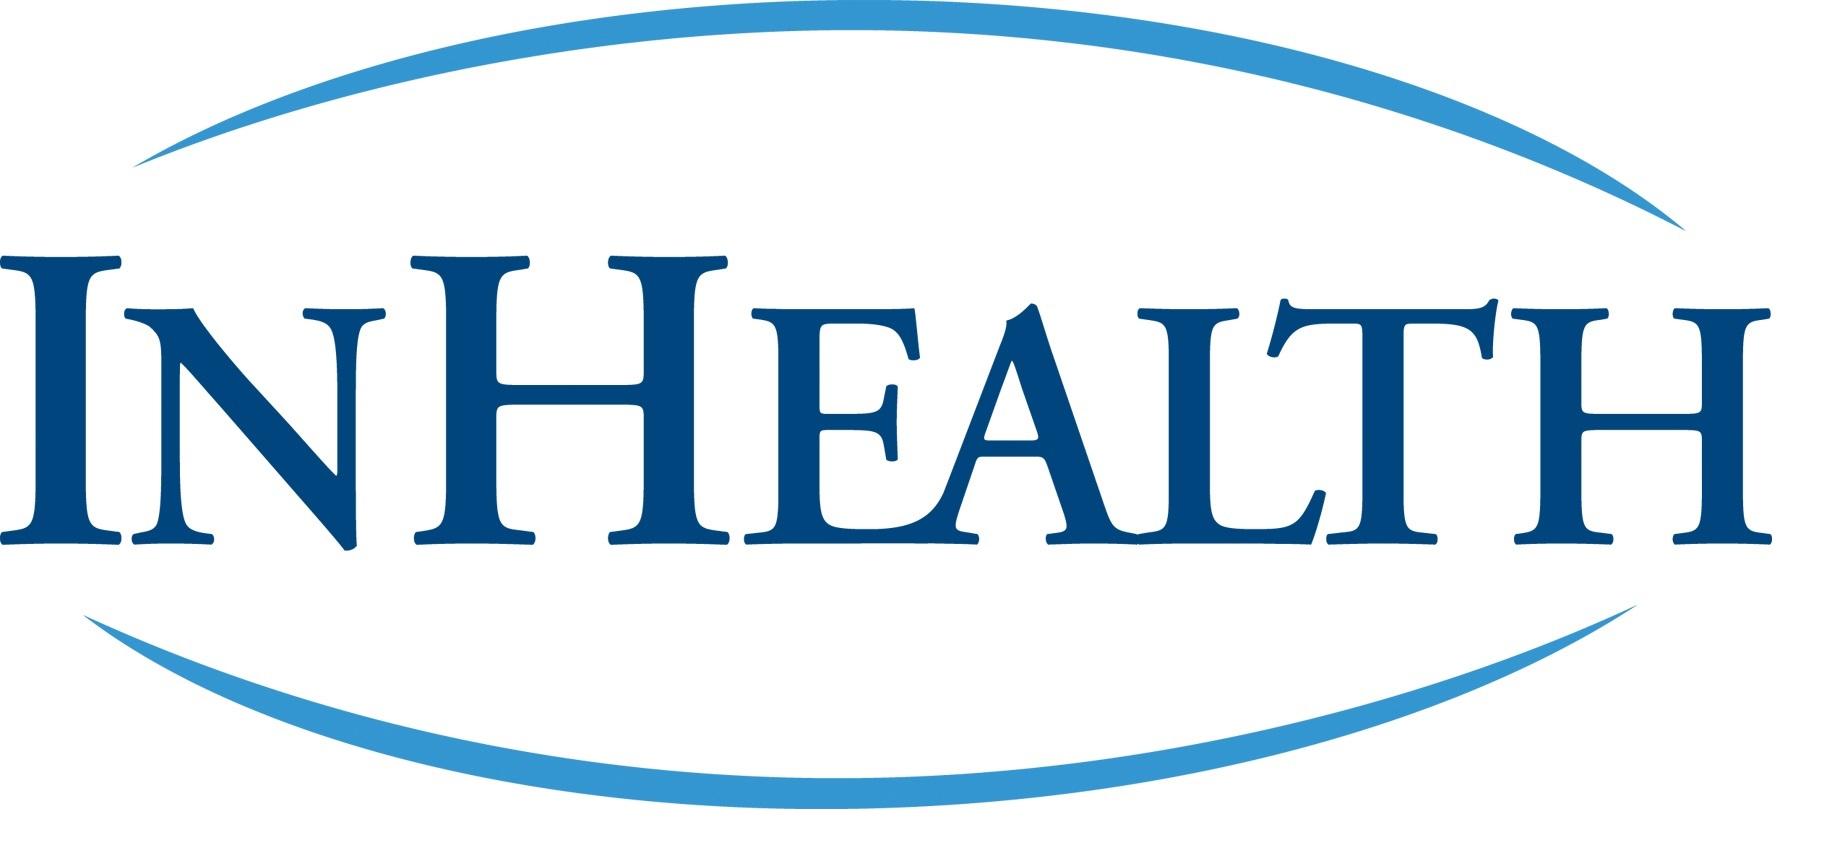 Inhealth Strengthens Long Term Imaging Partnership With